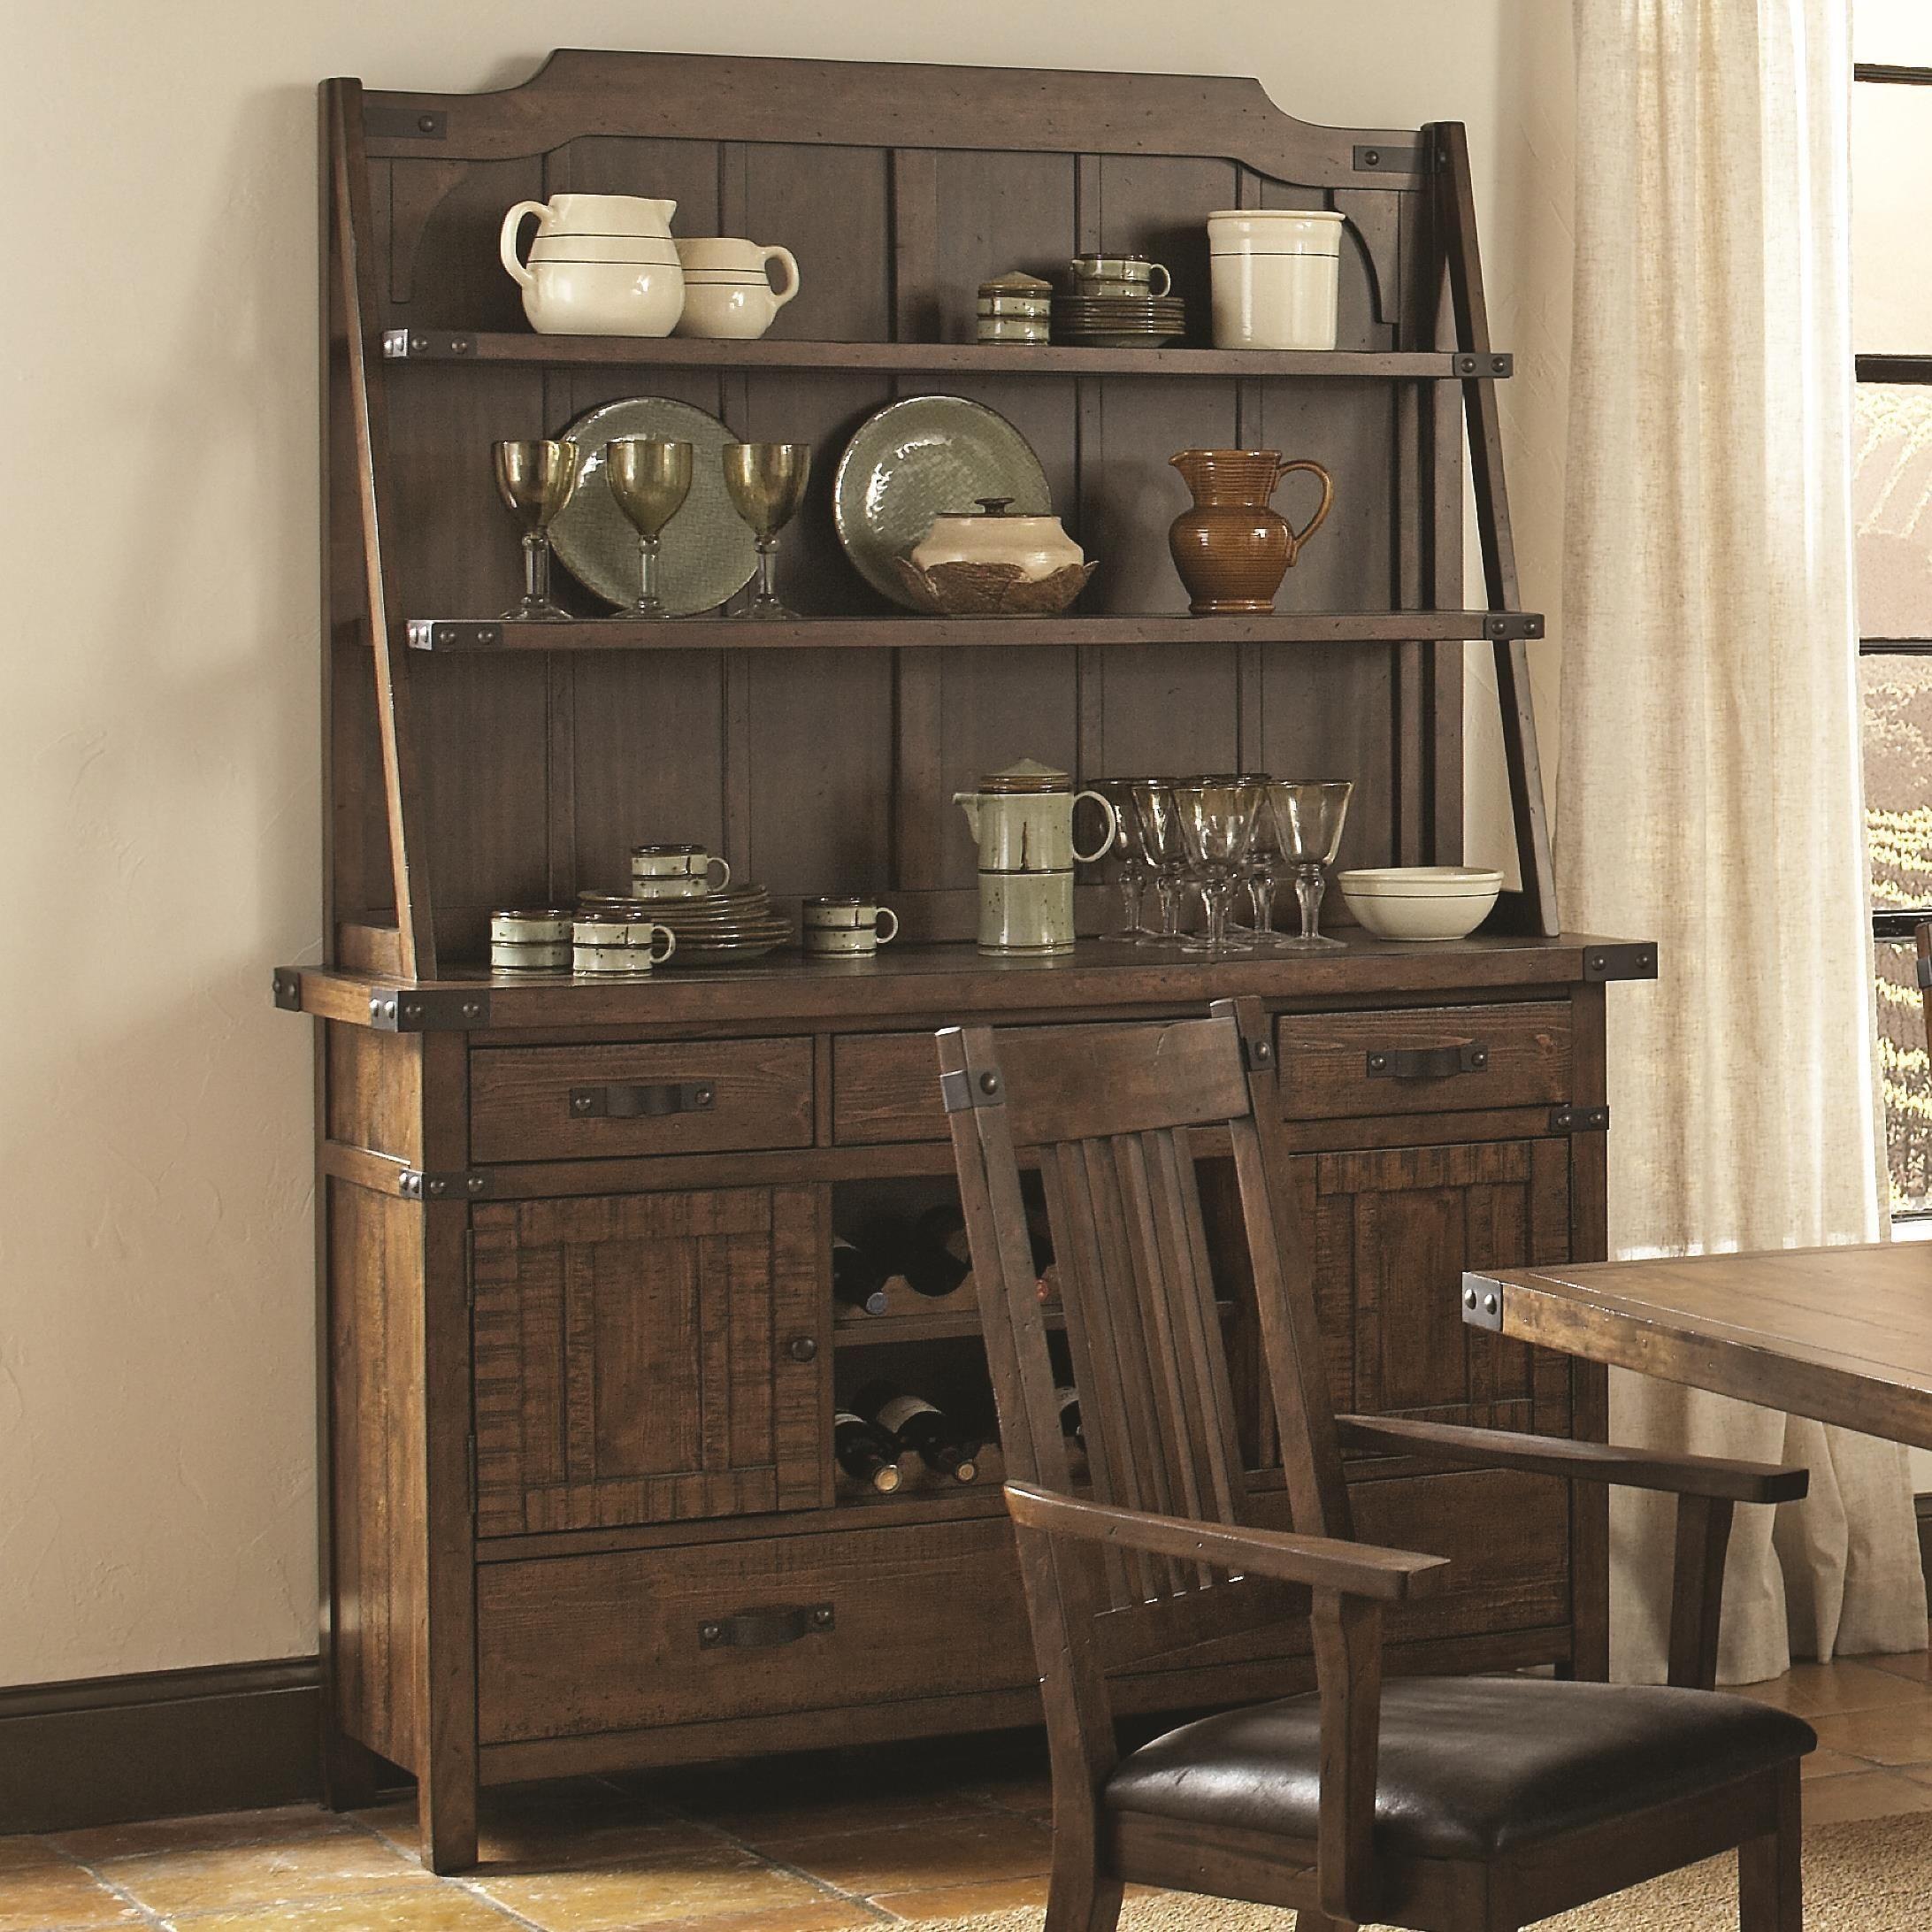 Rustic buffet table furniture - Padima Rustic Rough Sawn Buffet With Hutch Coaster Furniture